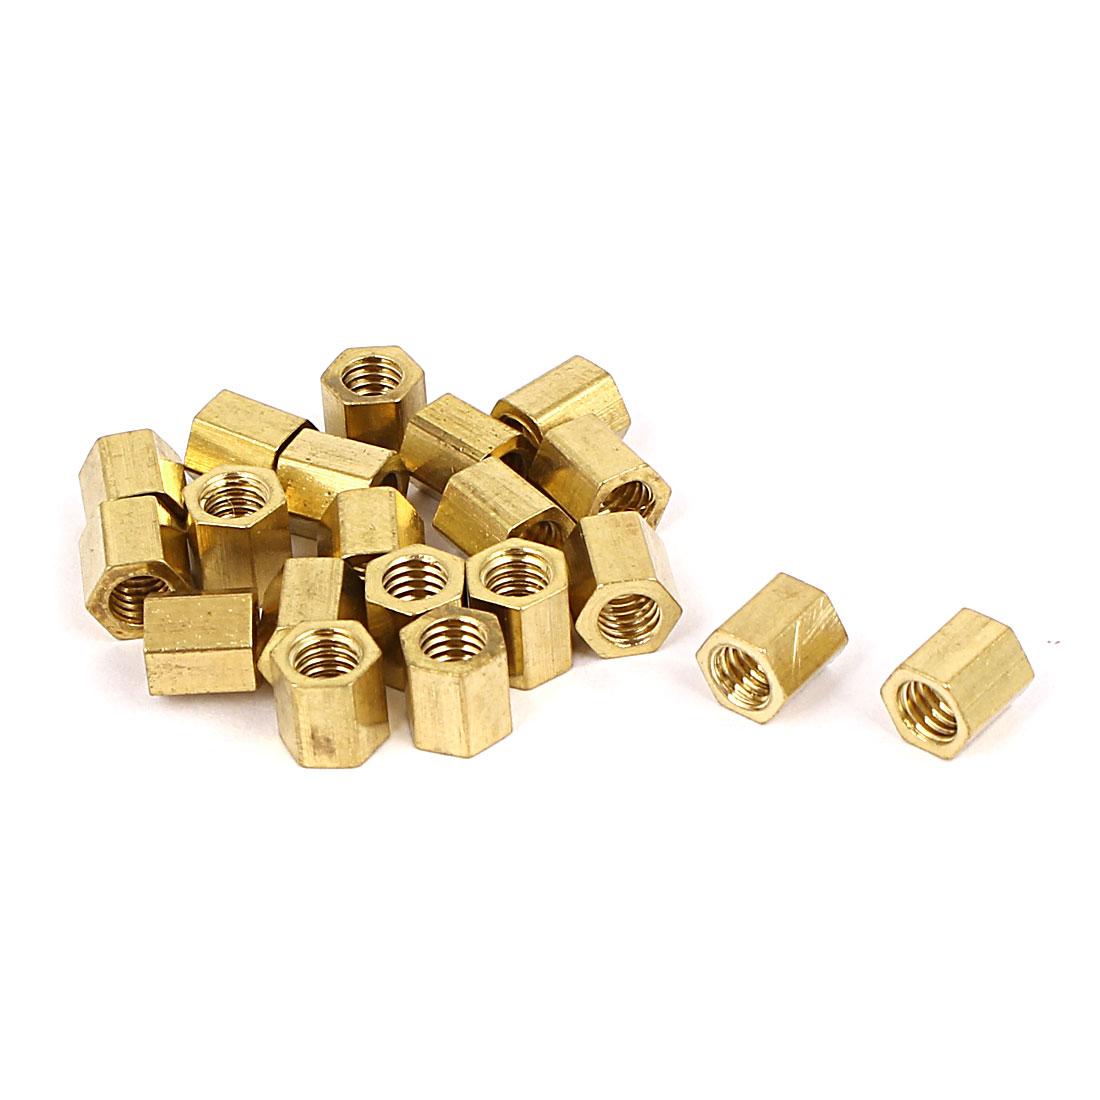 M4 x 6mm Female/Female Thread Brass Hex Standoff PCB Pillar Spacer 20 Pcs